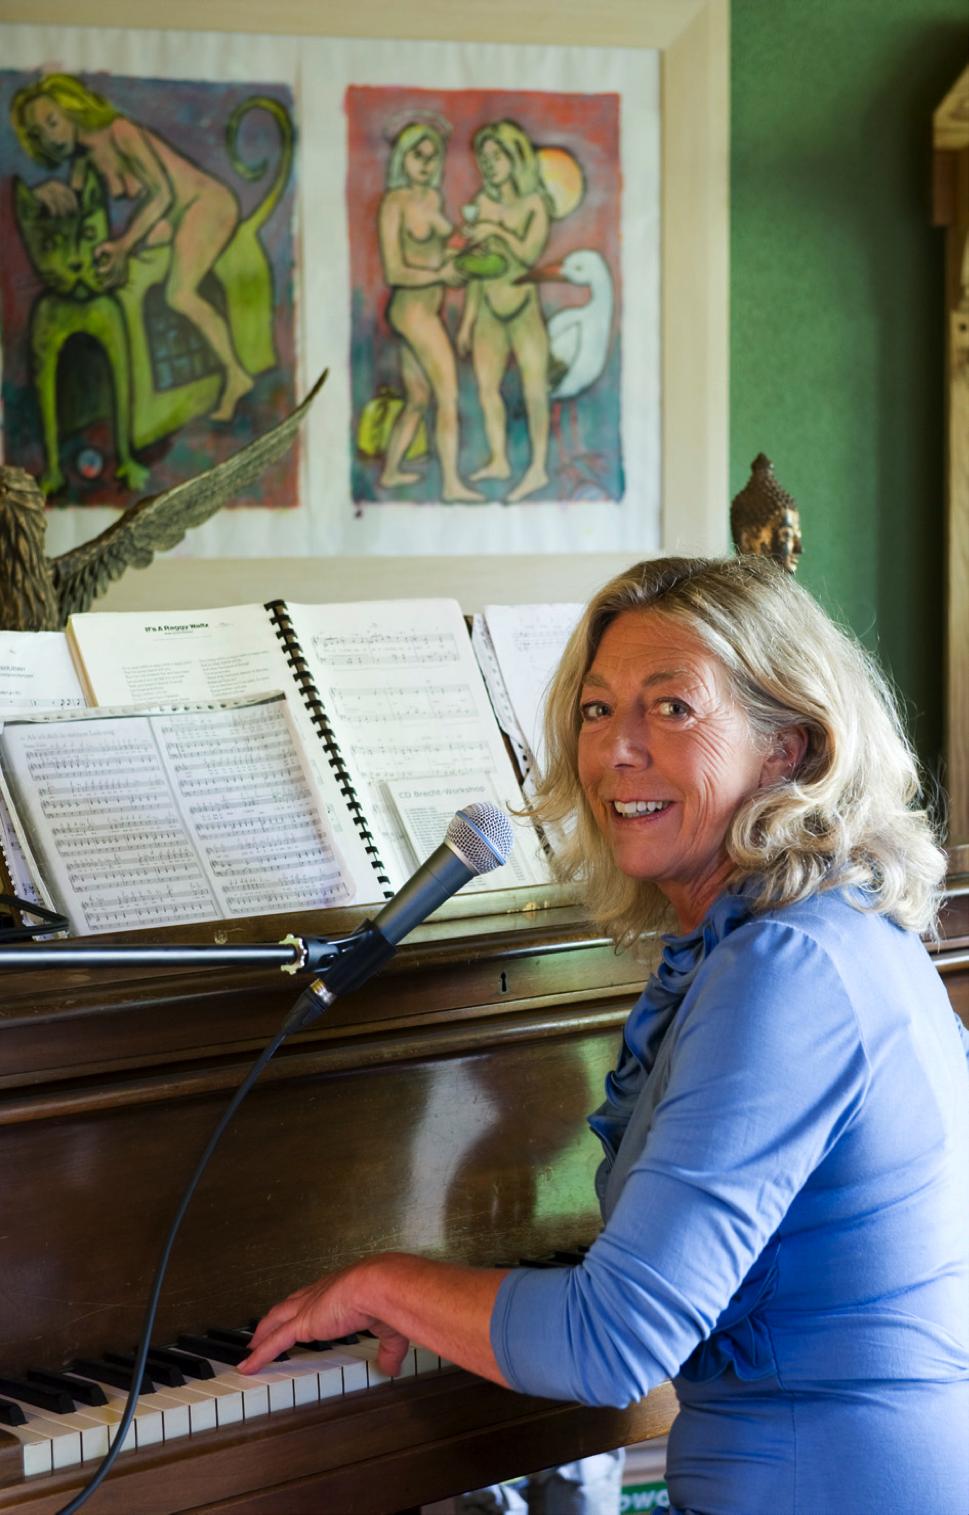 2012 Nienke Muijser